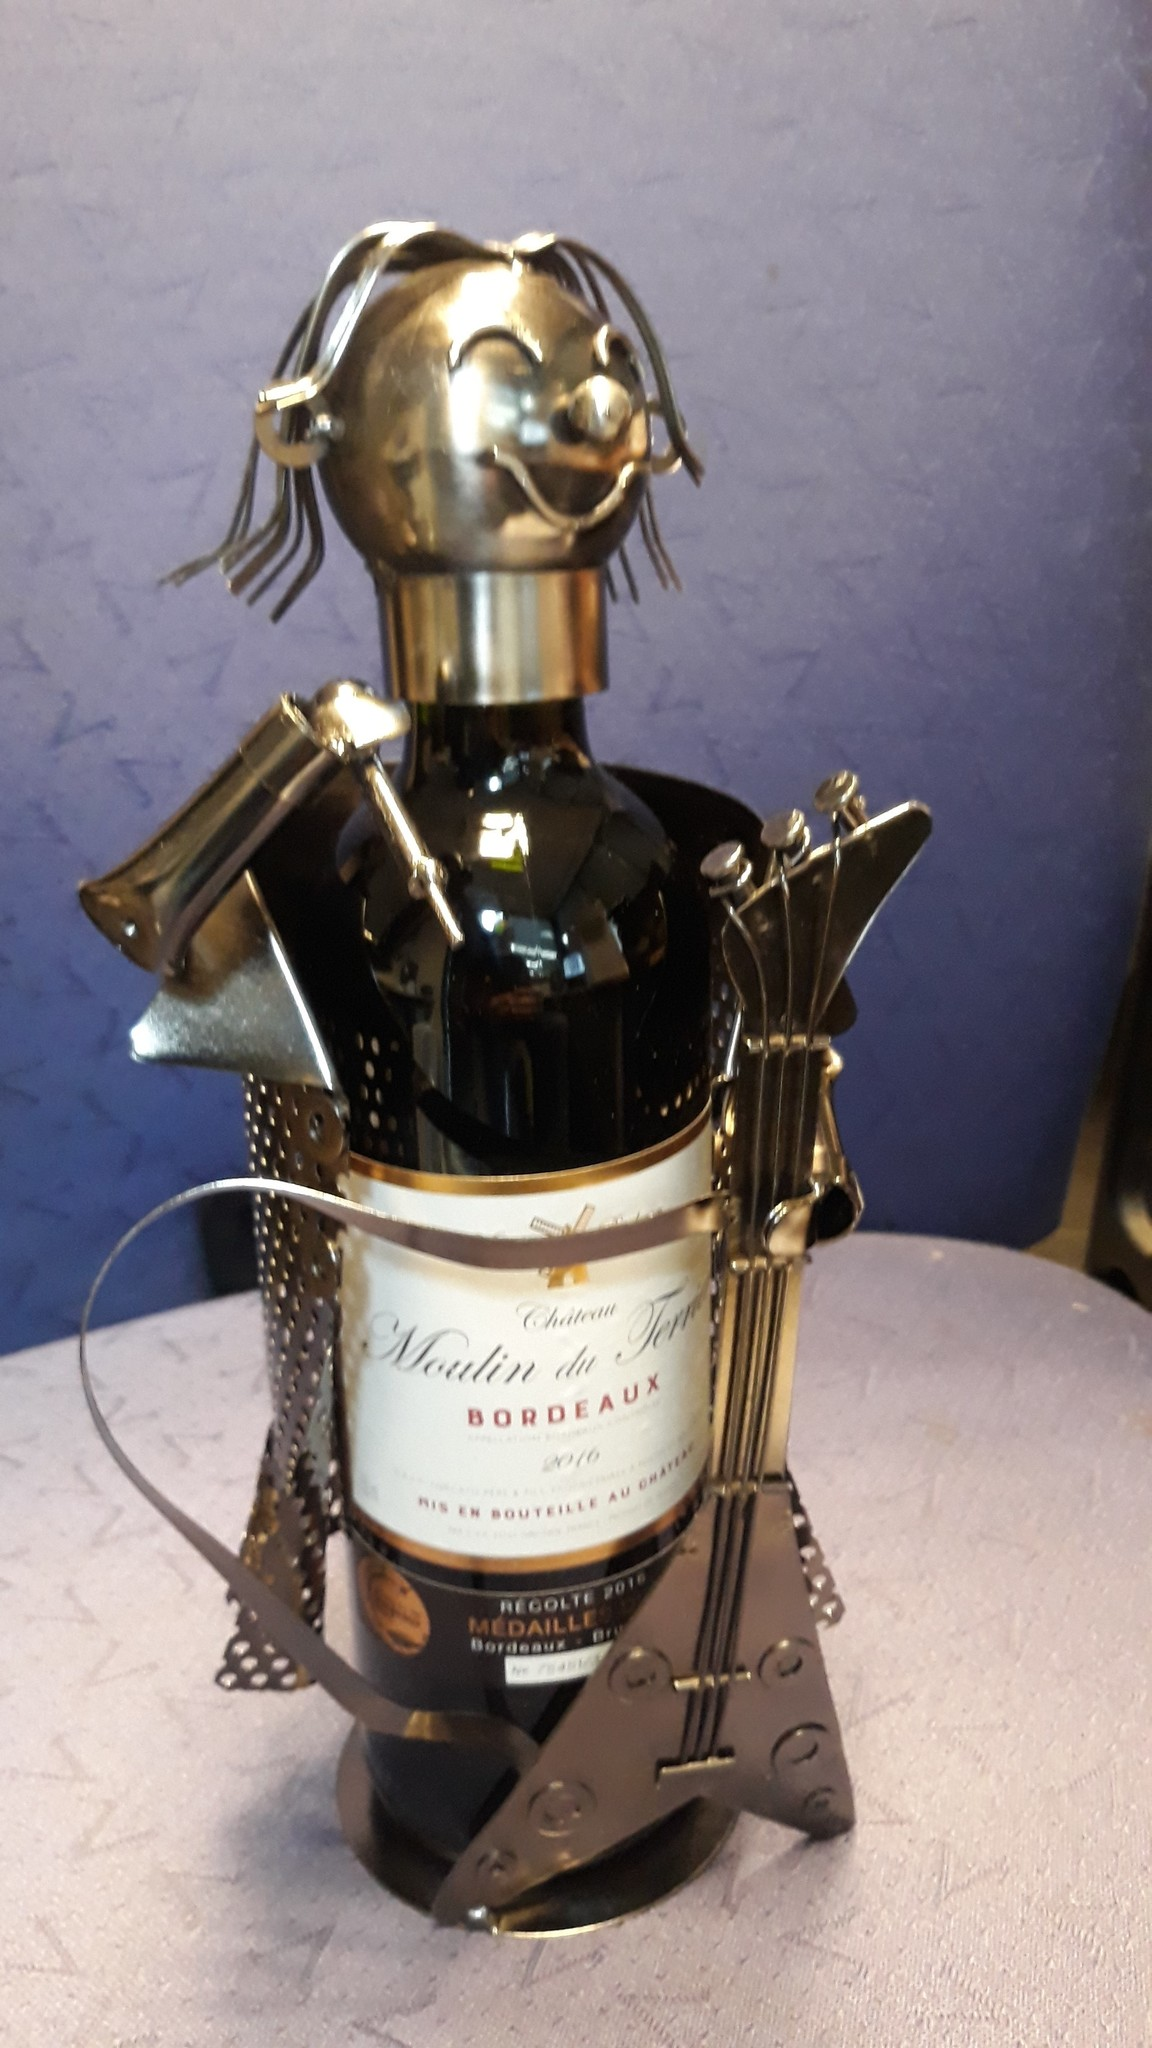 Wine bottle holder Singer guitarist